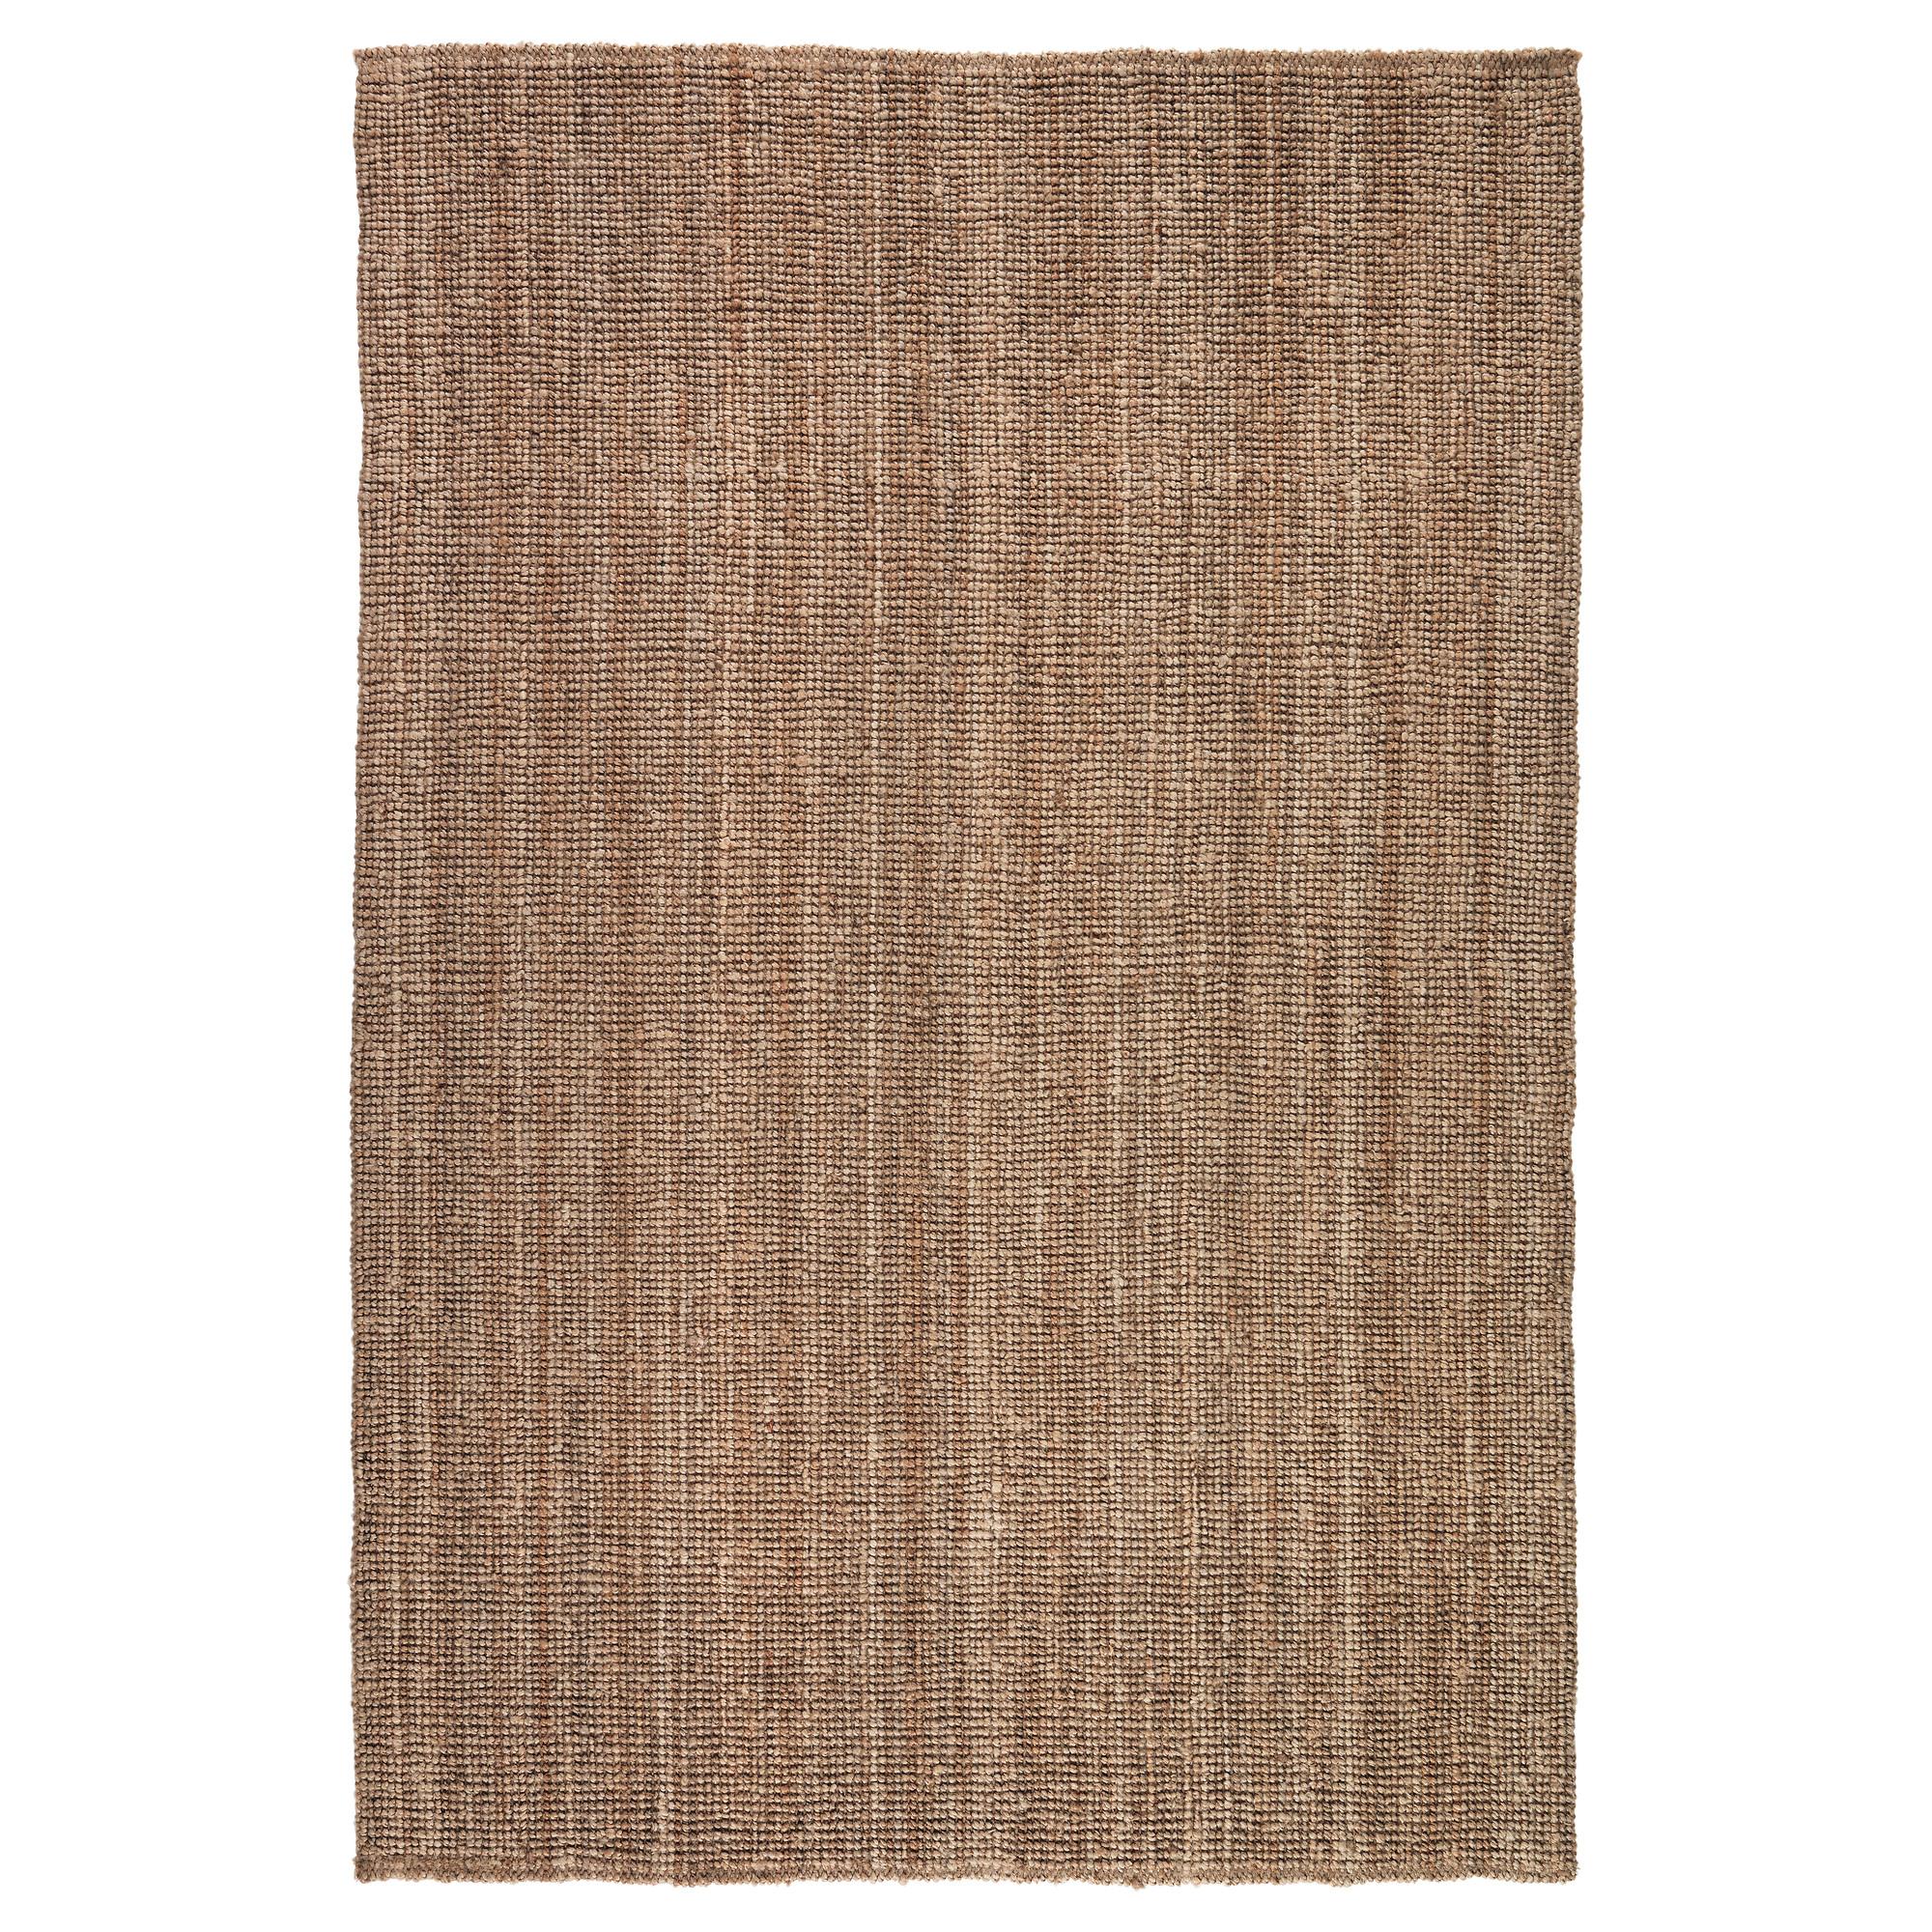 Lohals rug - Natural Flatwoven, 5'3